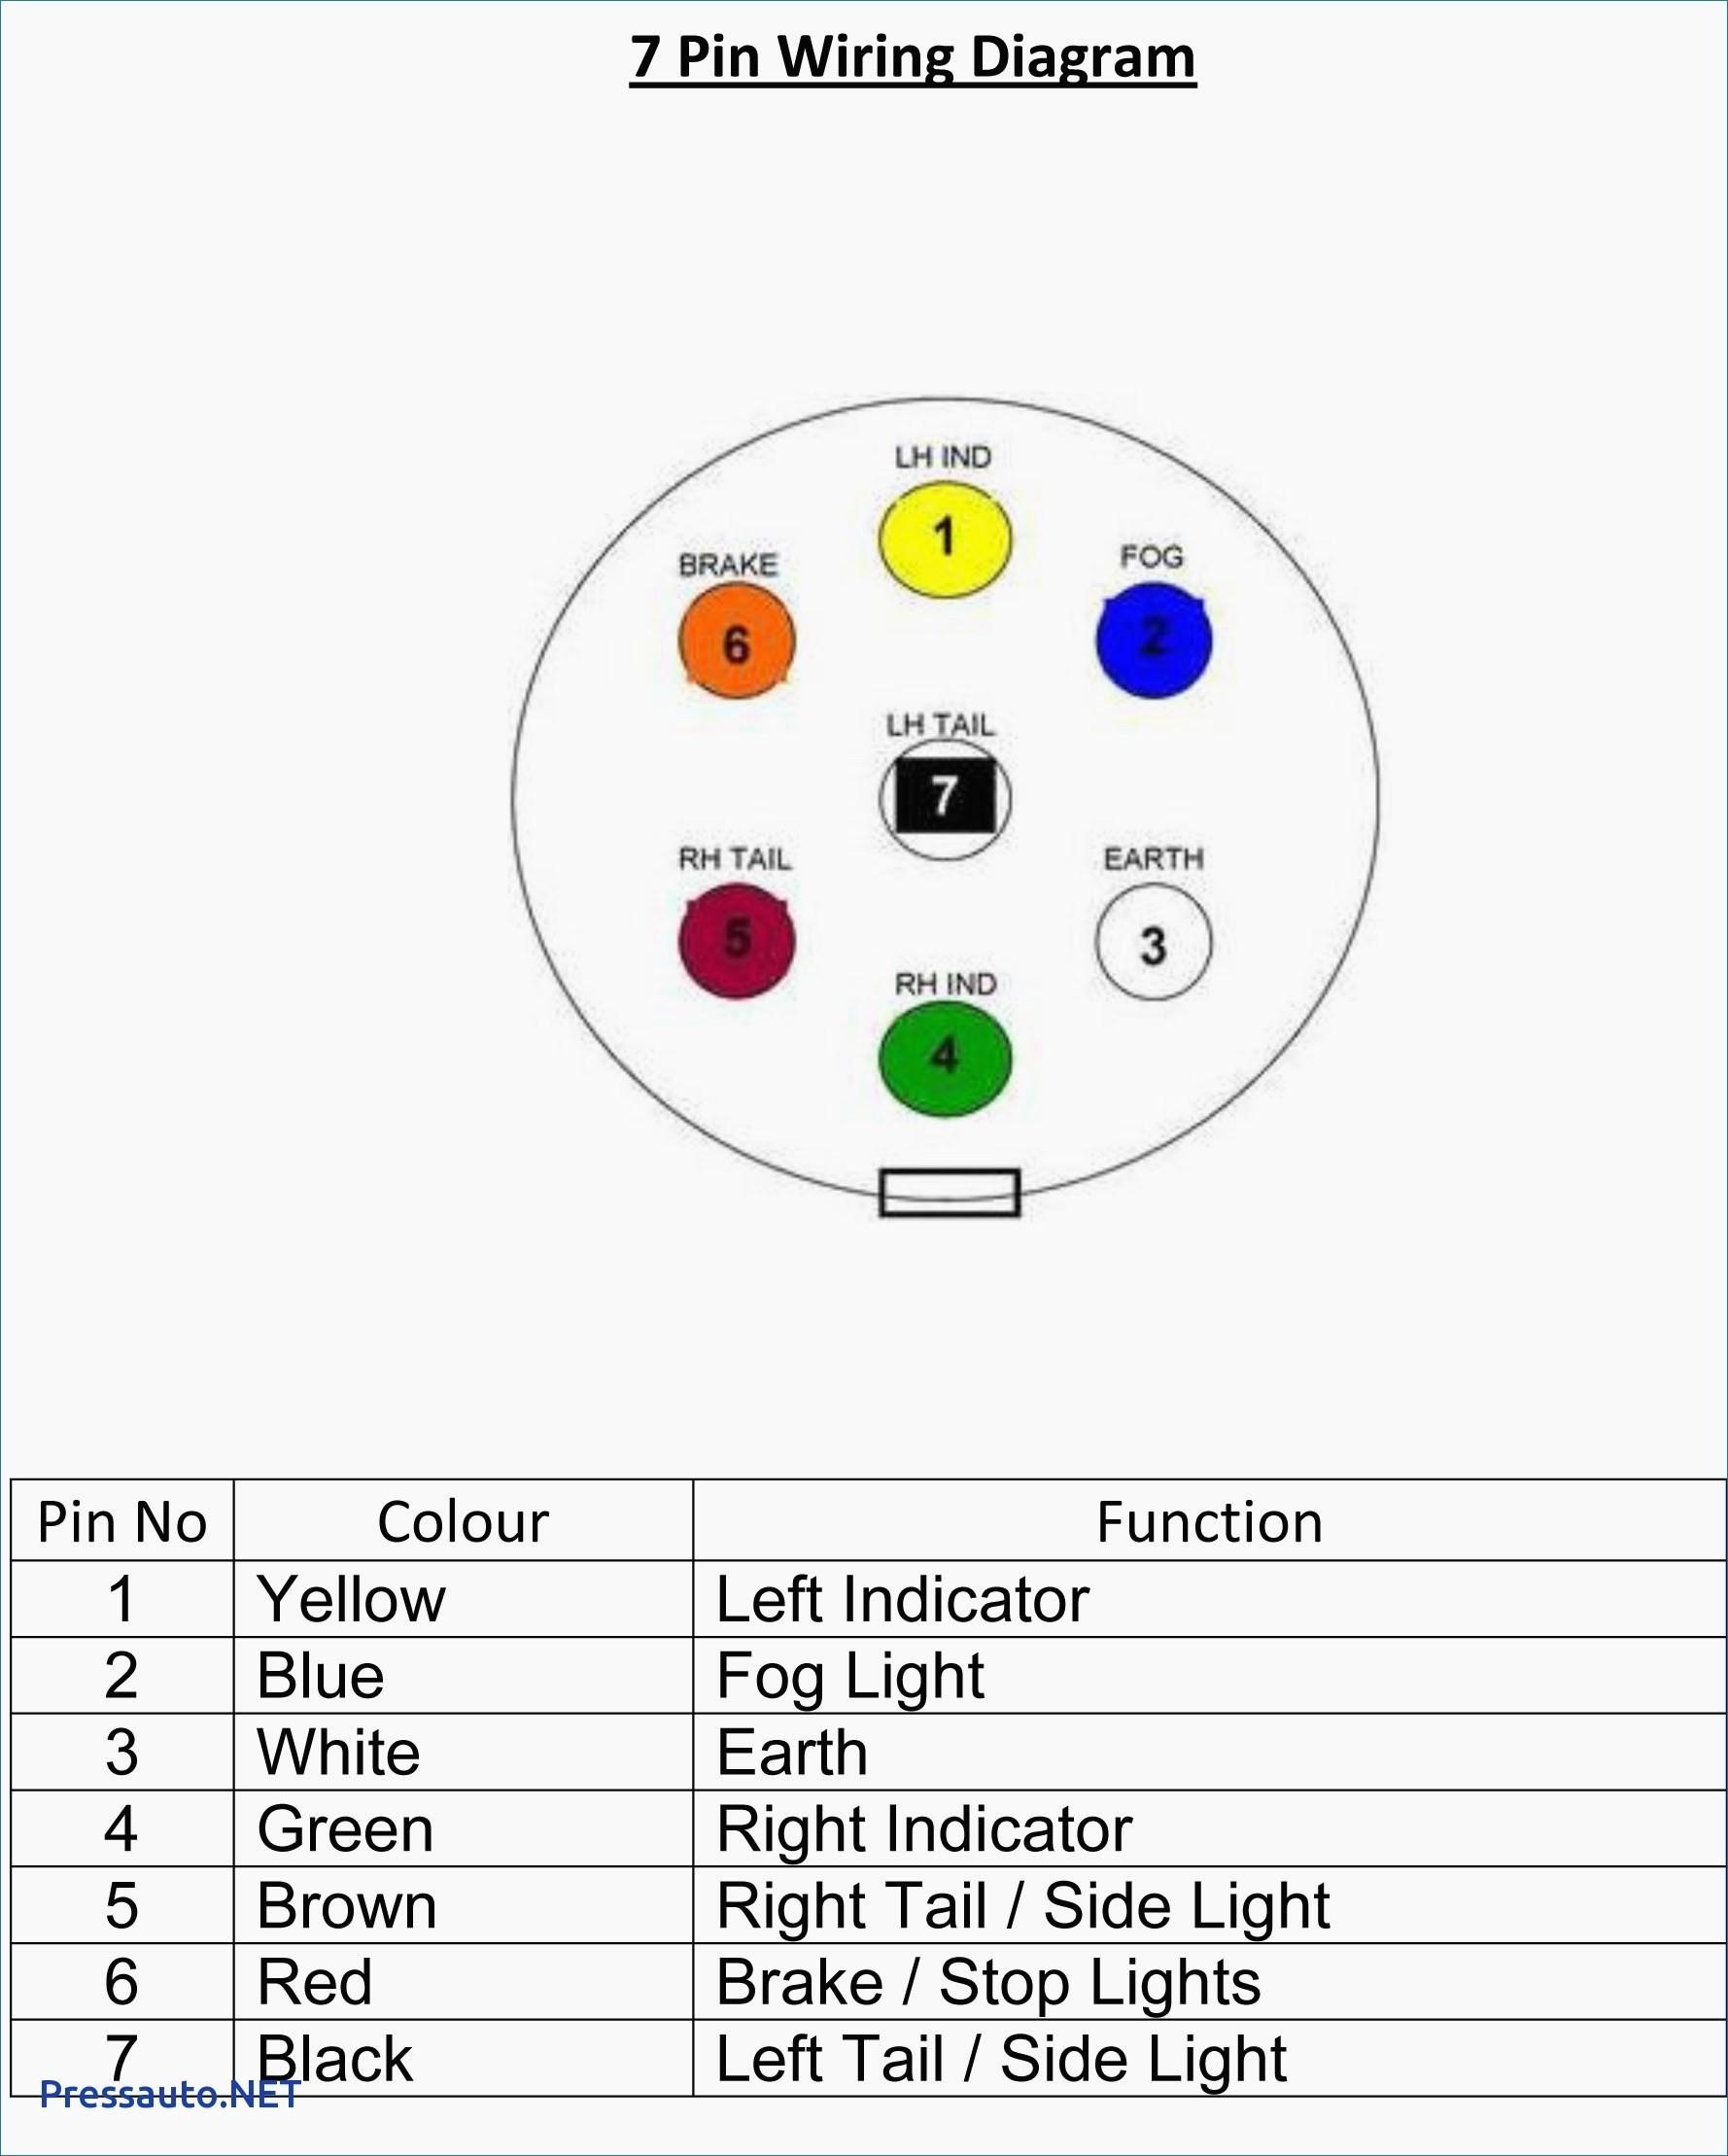 Pollak 7 Way Wiring Diagram   Wiring Library - Pollak Trailer Plug Wiring Diagram